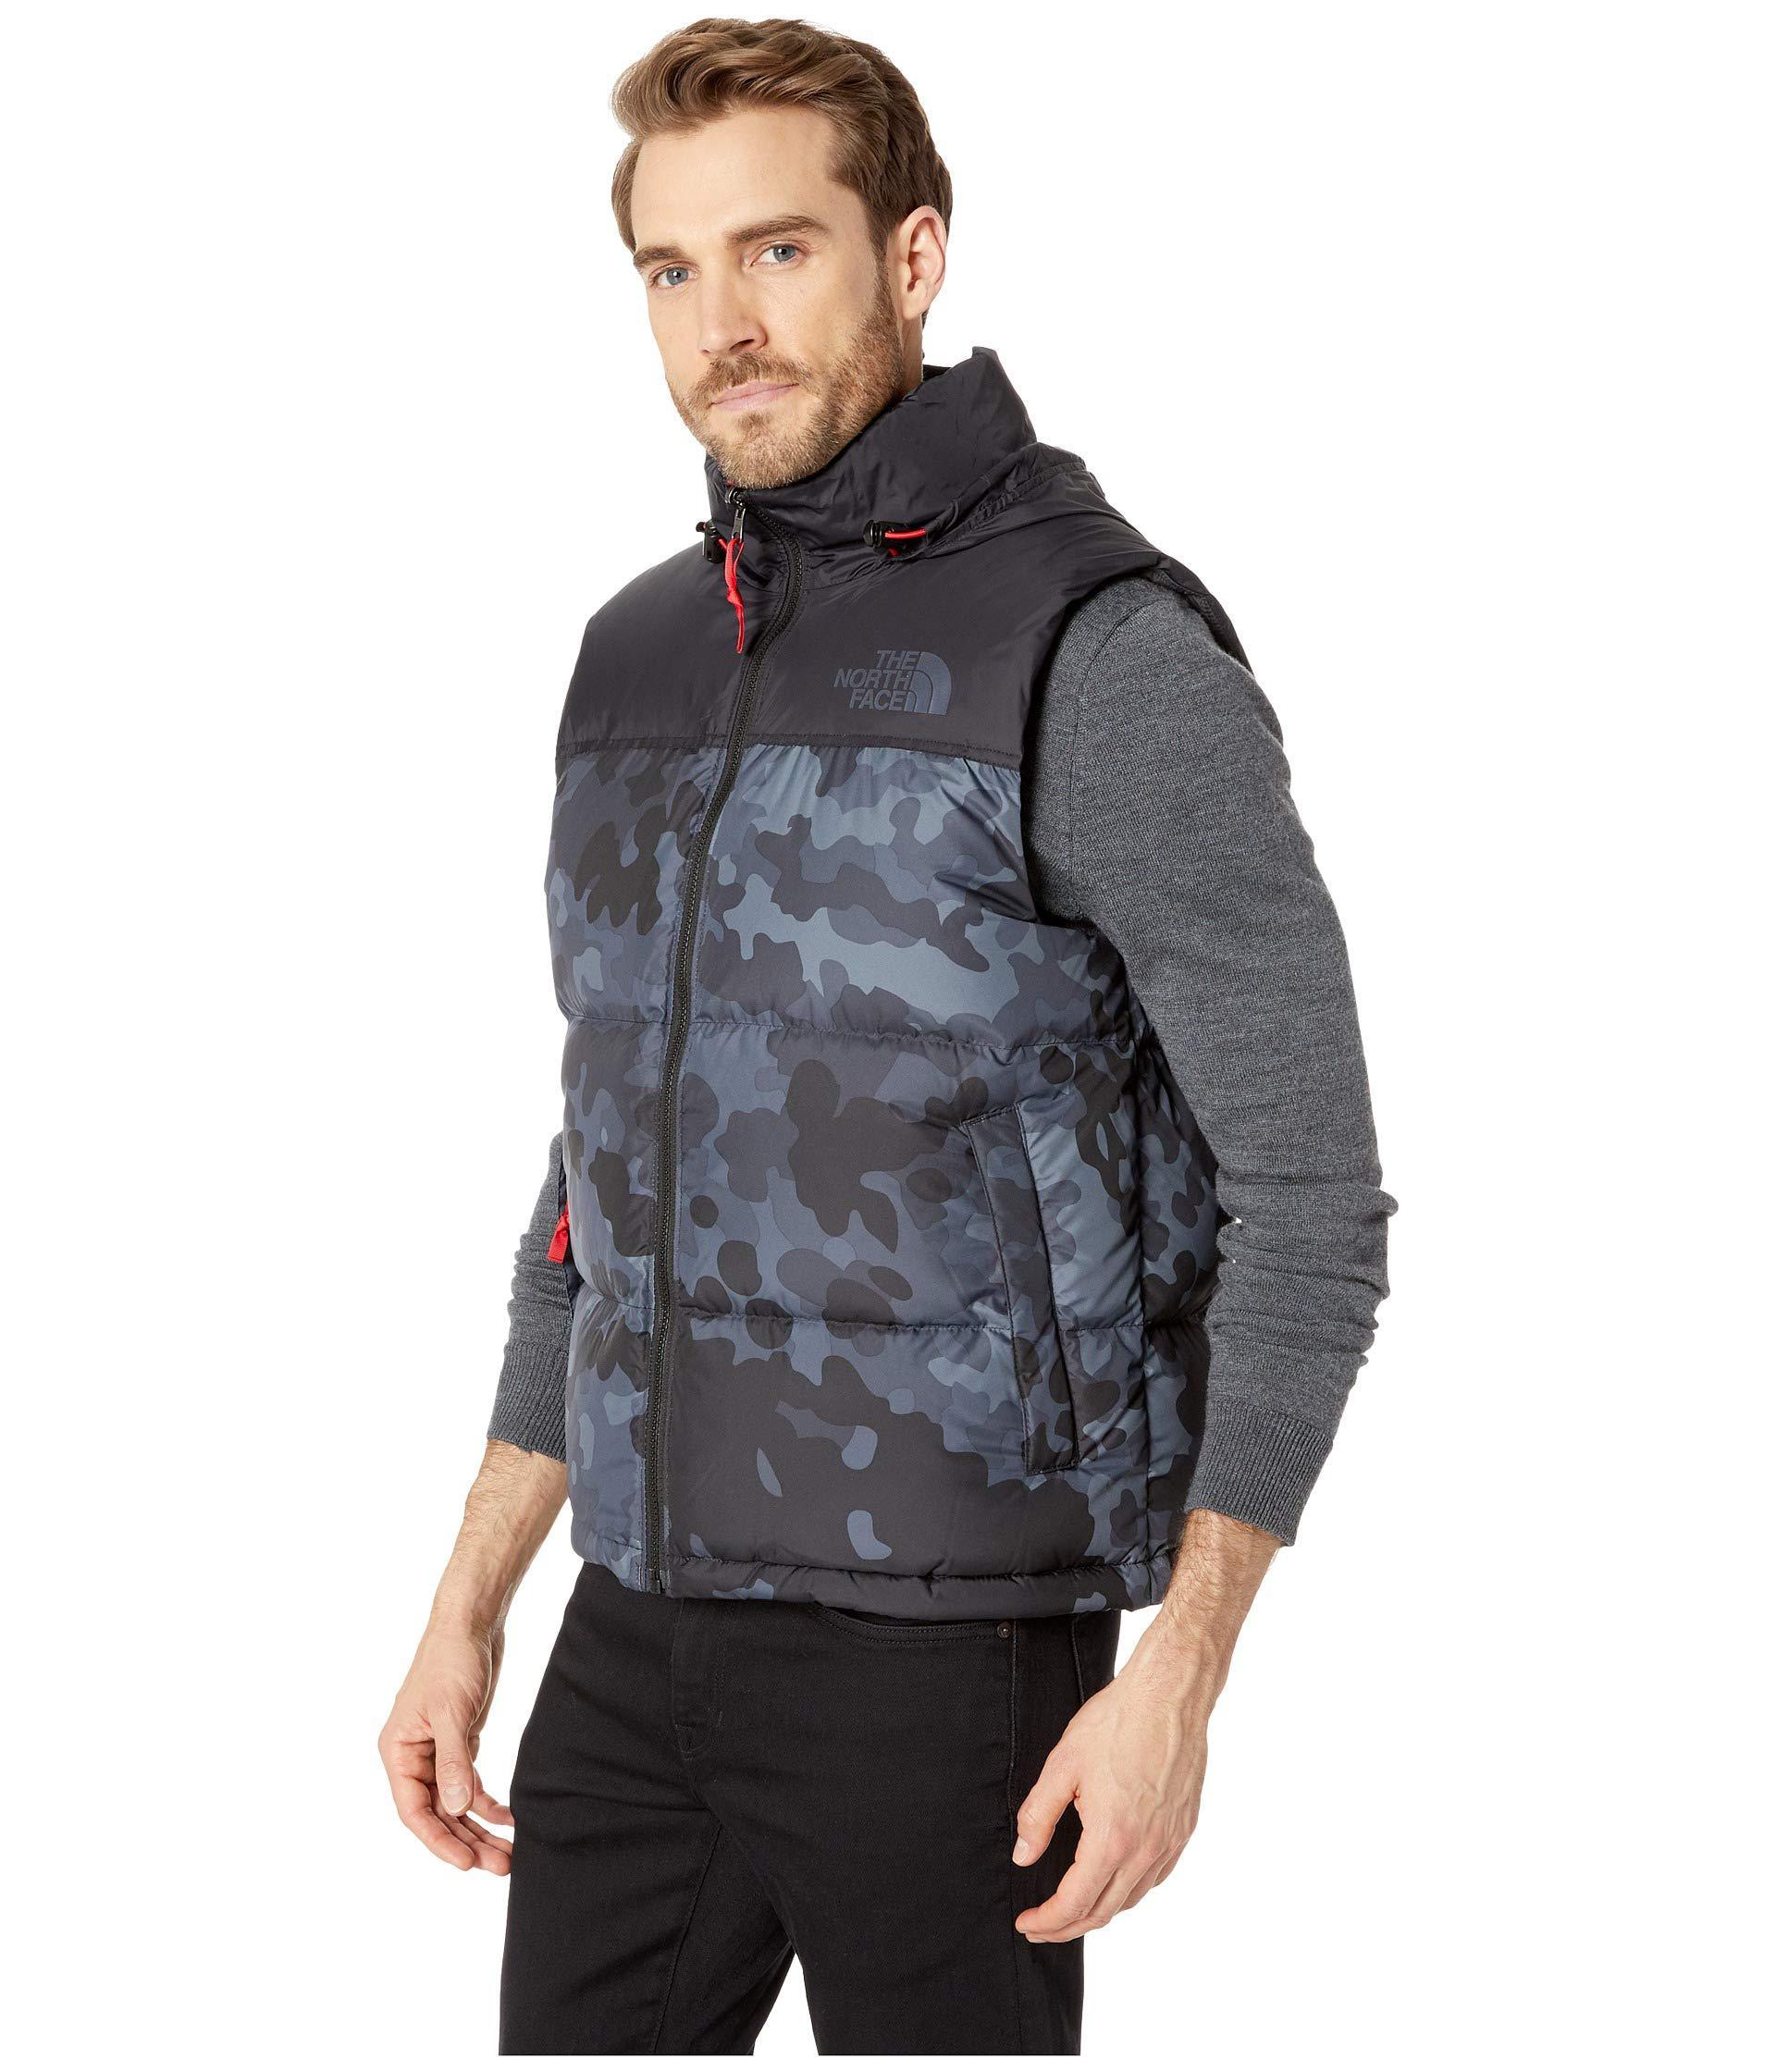 79973bc953 Lyst - The North Face 1996 Retro Novelty Nuptse Vest (tnf Black Multi  Dobby) Men s Vest in Black for Men